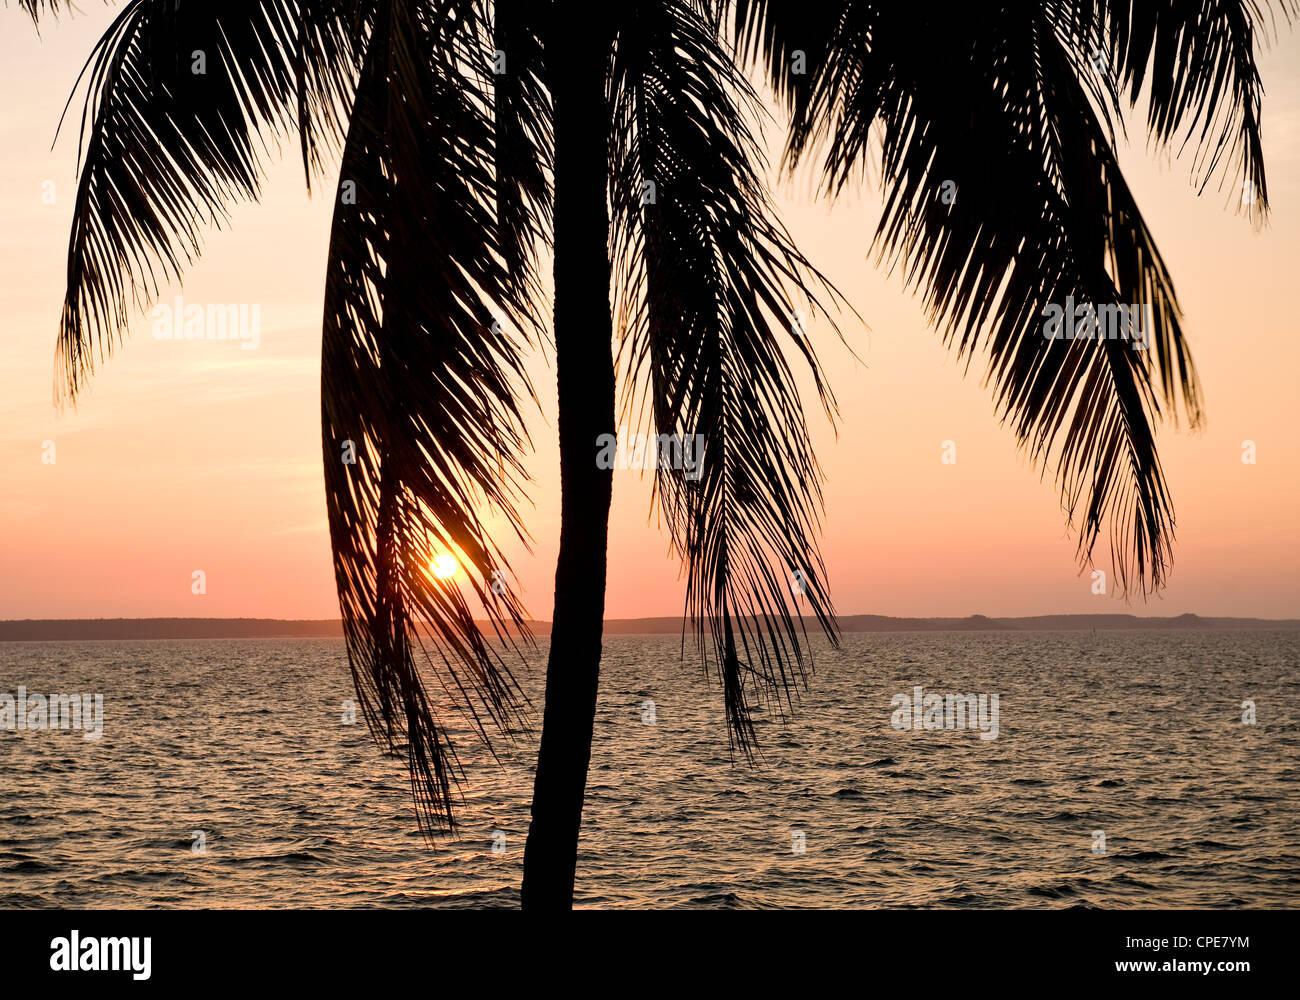 Punta Gorda, Cienfuegos, Kuba, Karibik, Karibik, Mittelamerika Stockbild